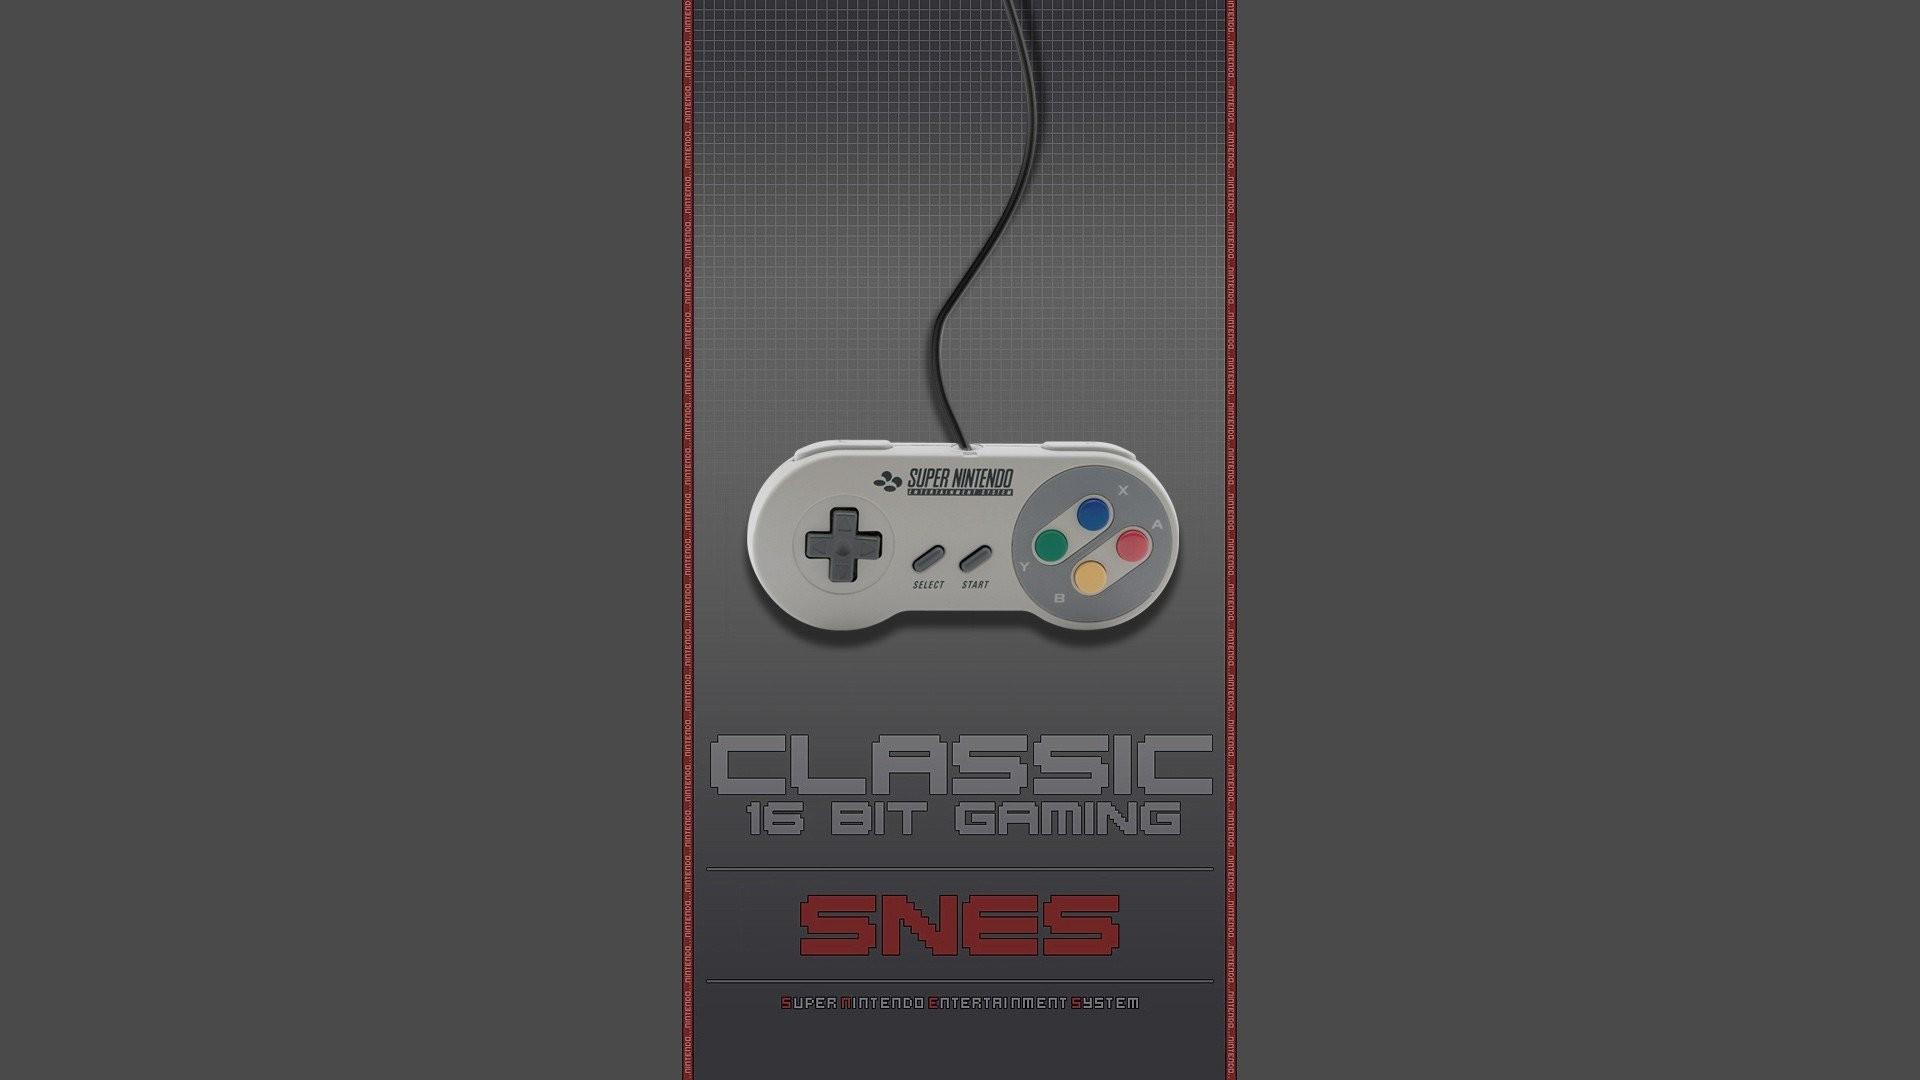 Video games Classic Super Nintendo 16-bit wallpaper | | 253995 |  WallpaperUP